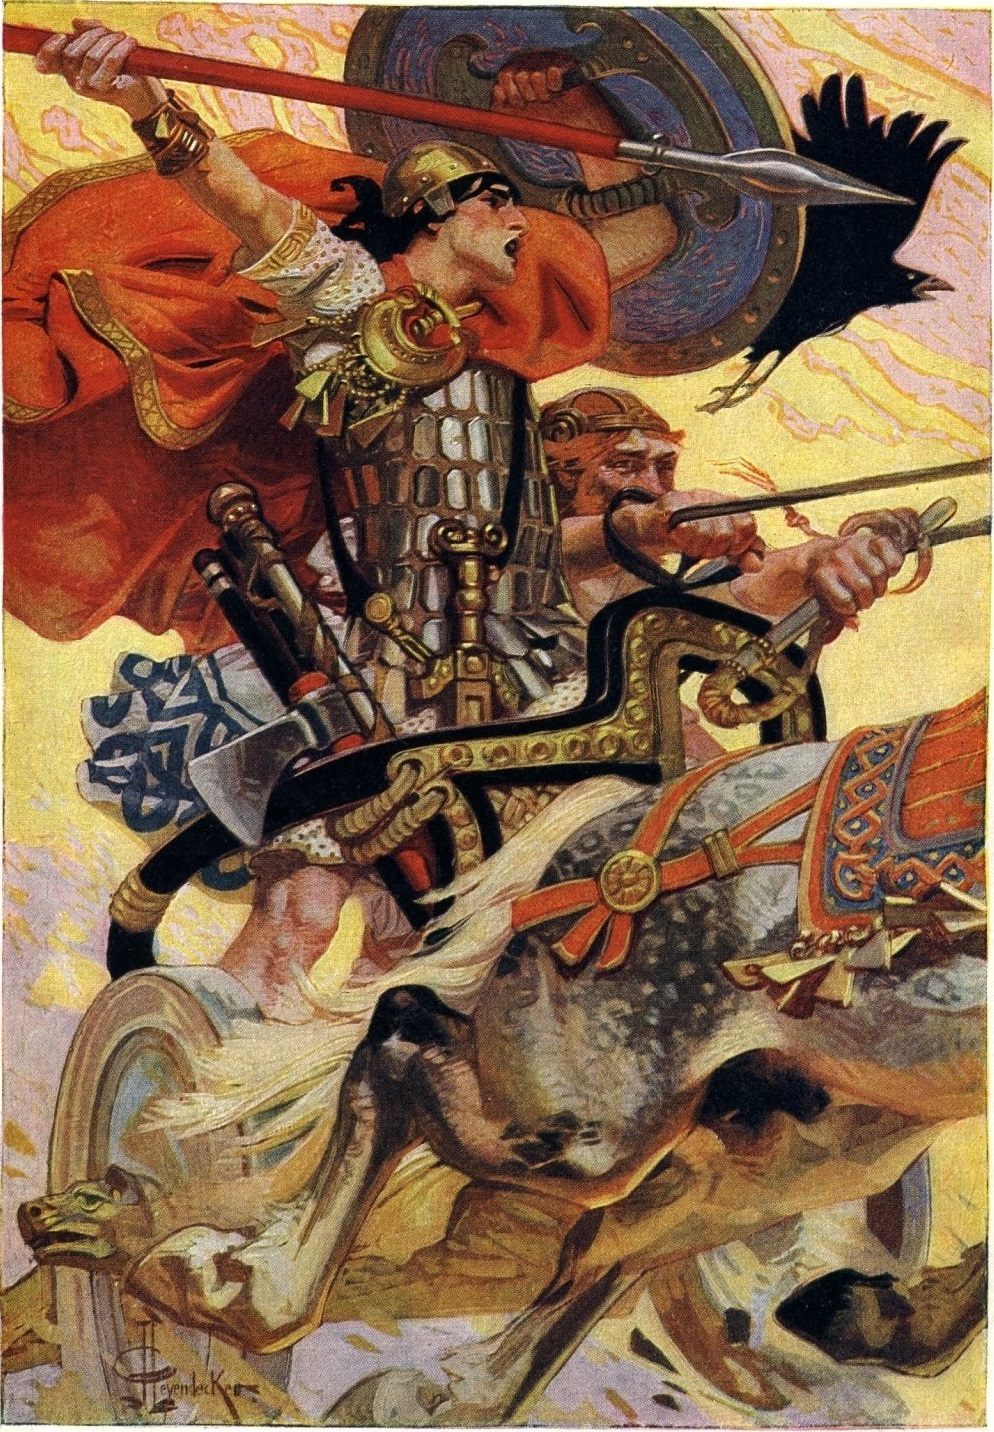 Cú Chulainn in Battle by Joseph Christian Leyendecker, Public Domain, https://commons.wikimedia.org/w/index.php?curid=3485459